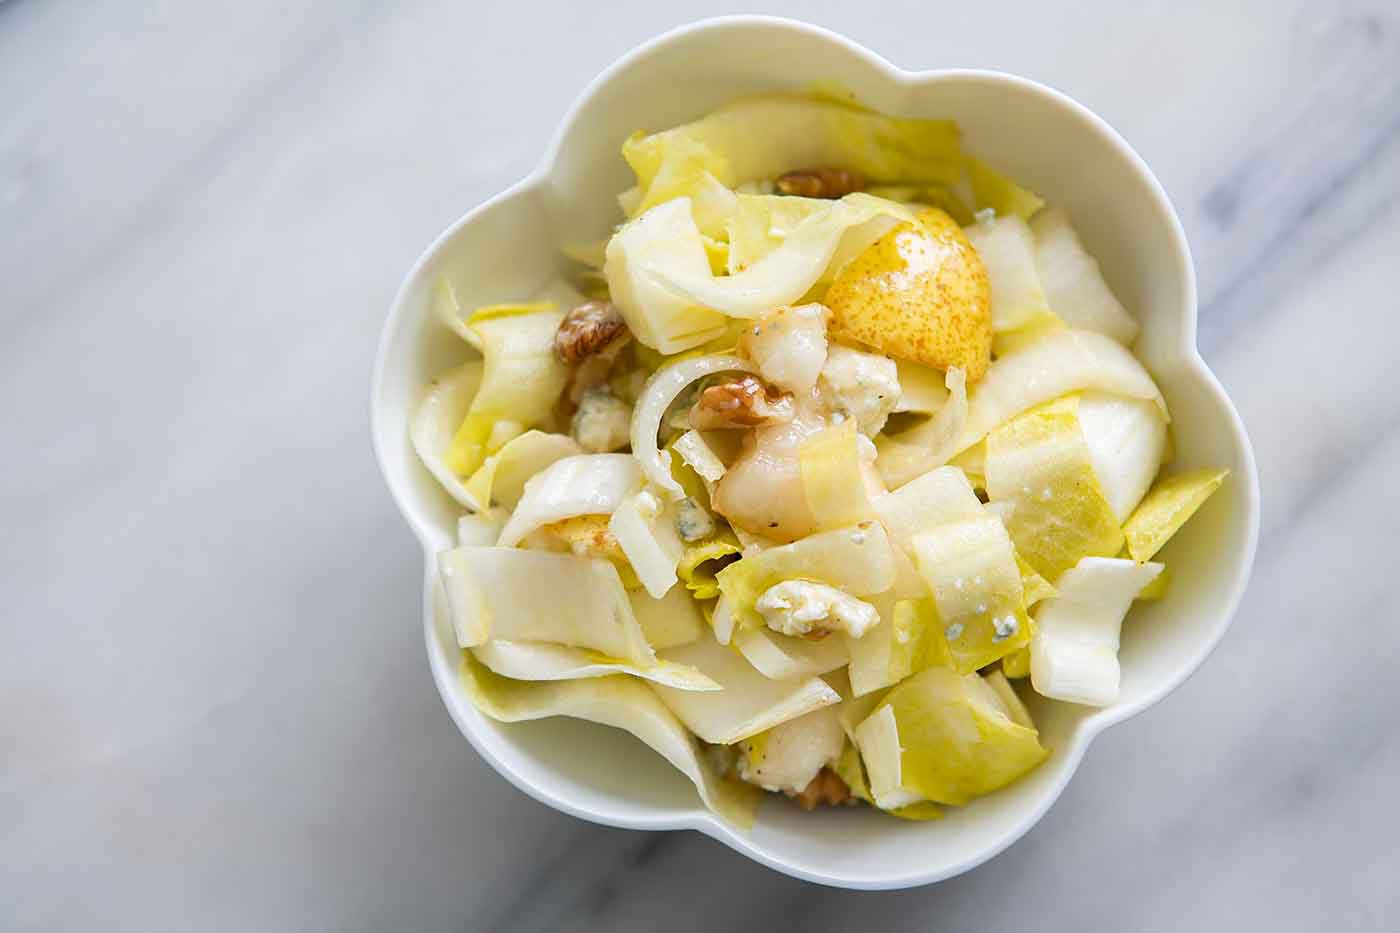 Endive Salad with Walnuts Pear Gorgonzola